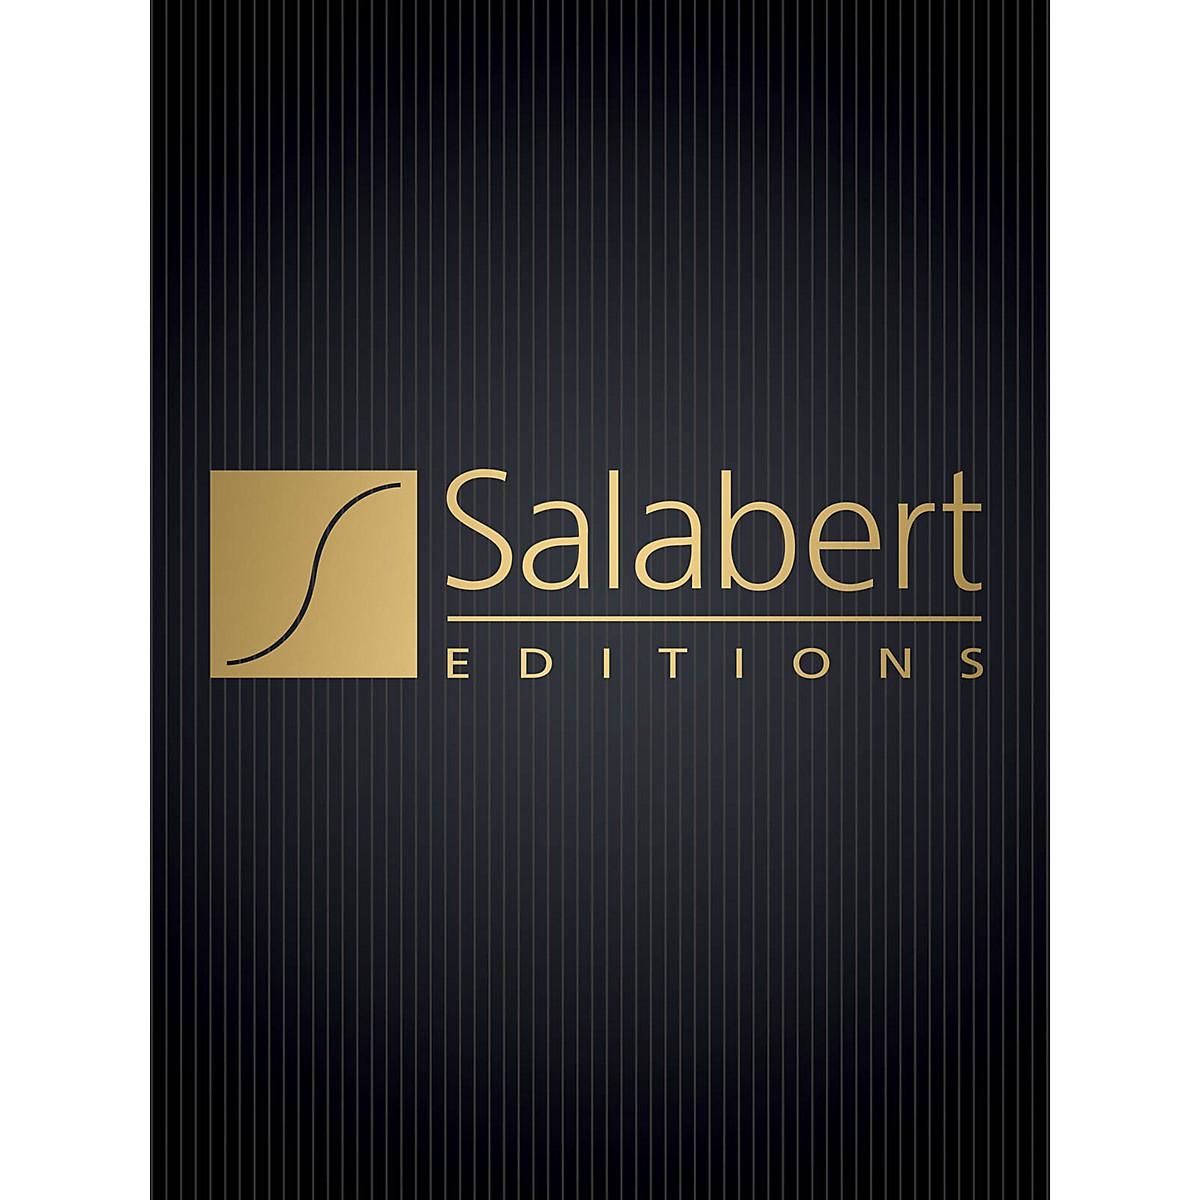 Salabert Sonatine bureaucratique (Revised Edition by Robert Orledge - Piano Solo) Piano Series Softcover